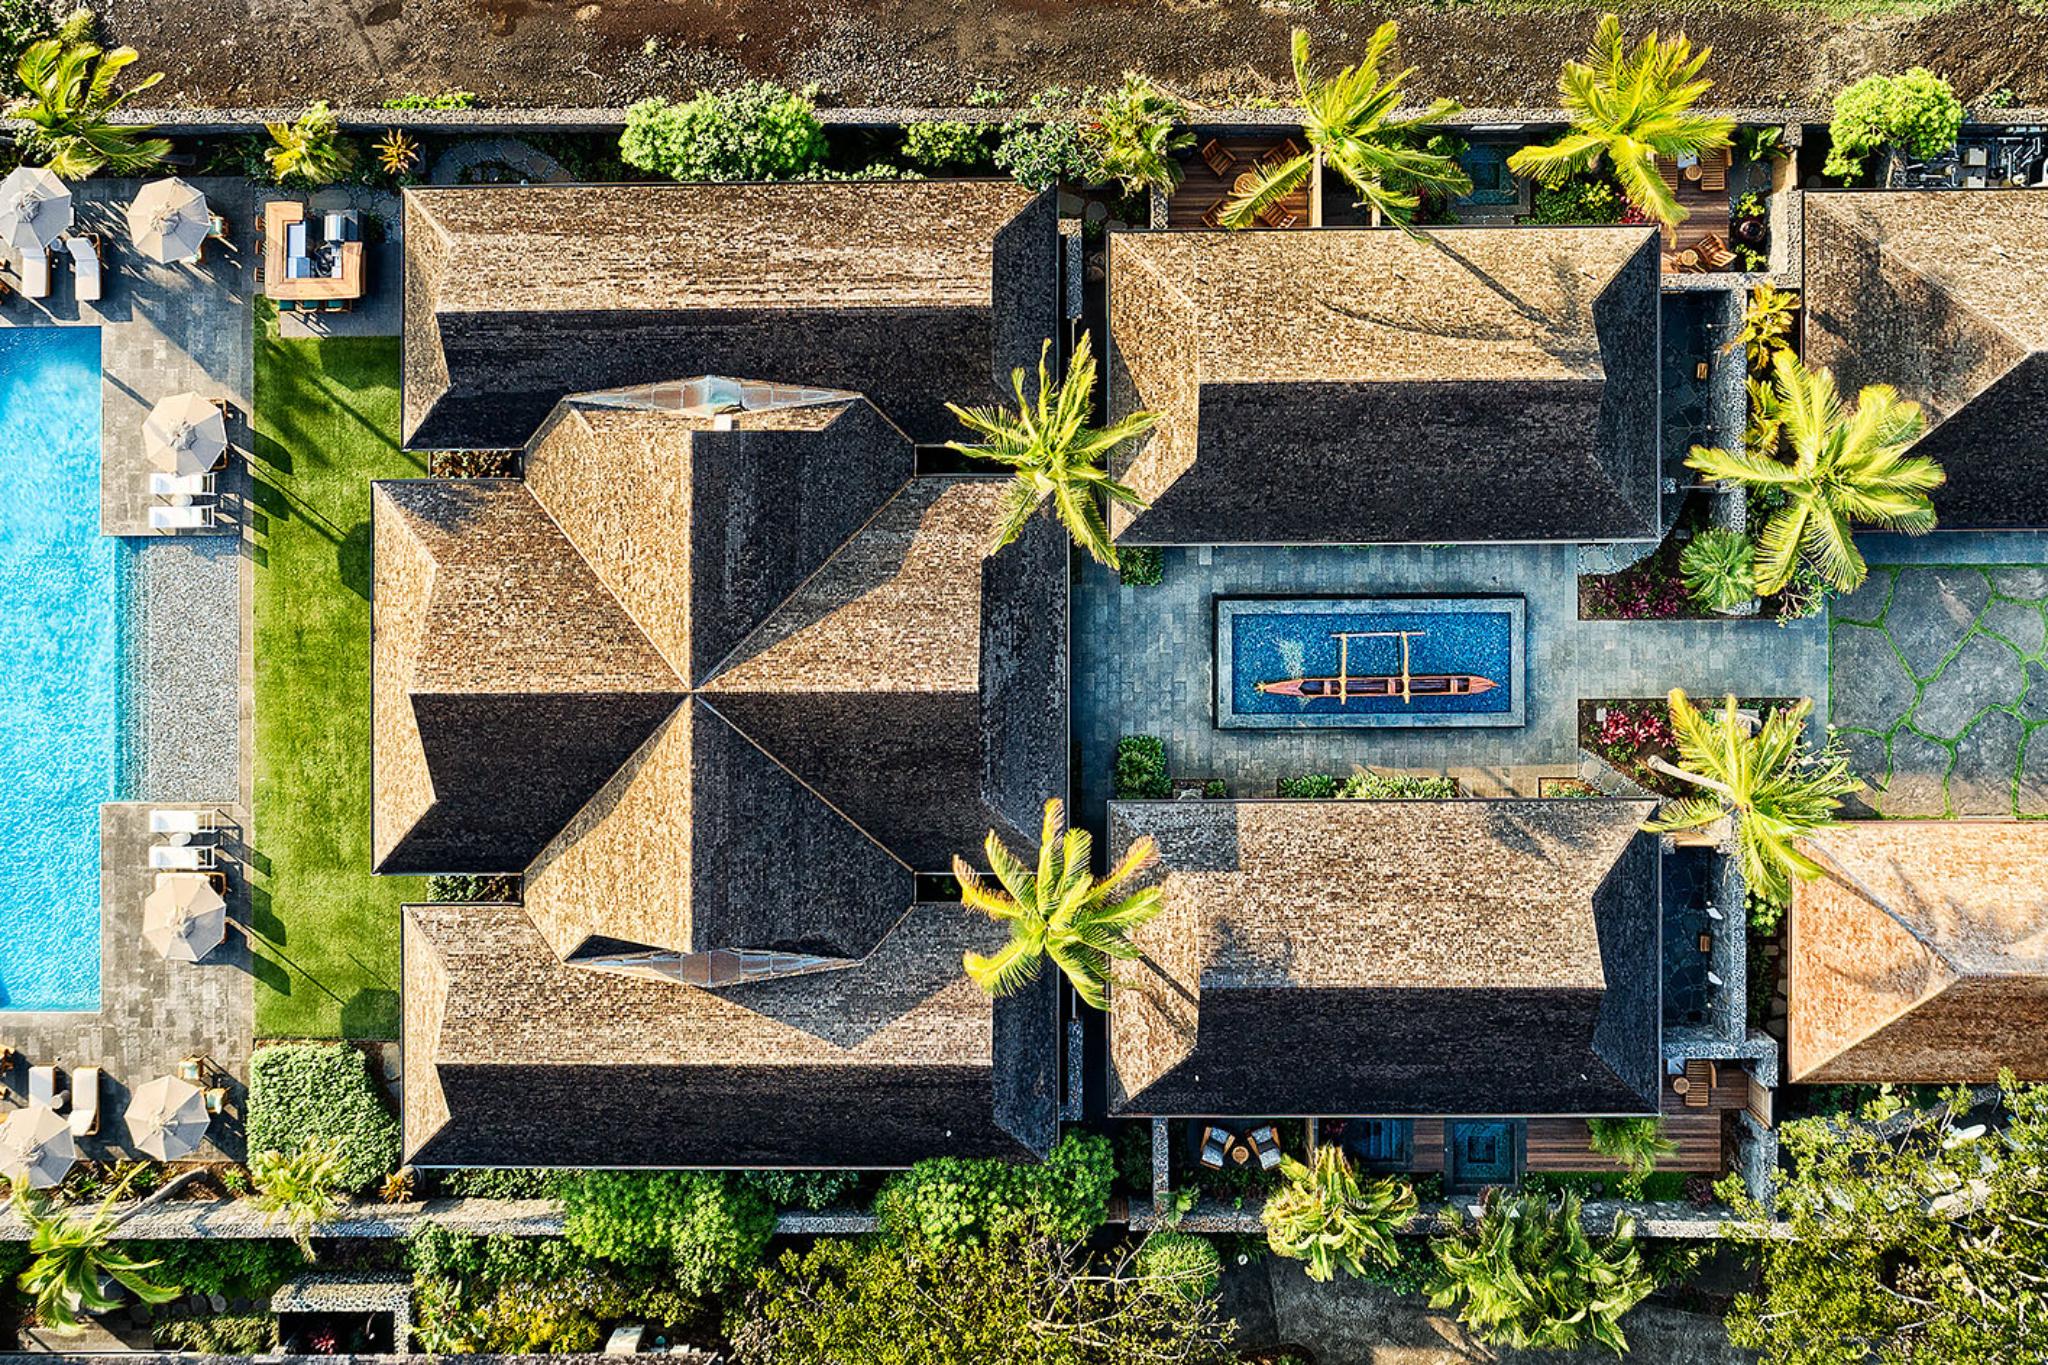 luxury-hotel-villa-aerial-photo-panaviz